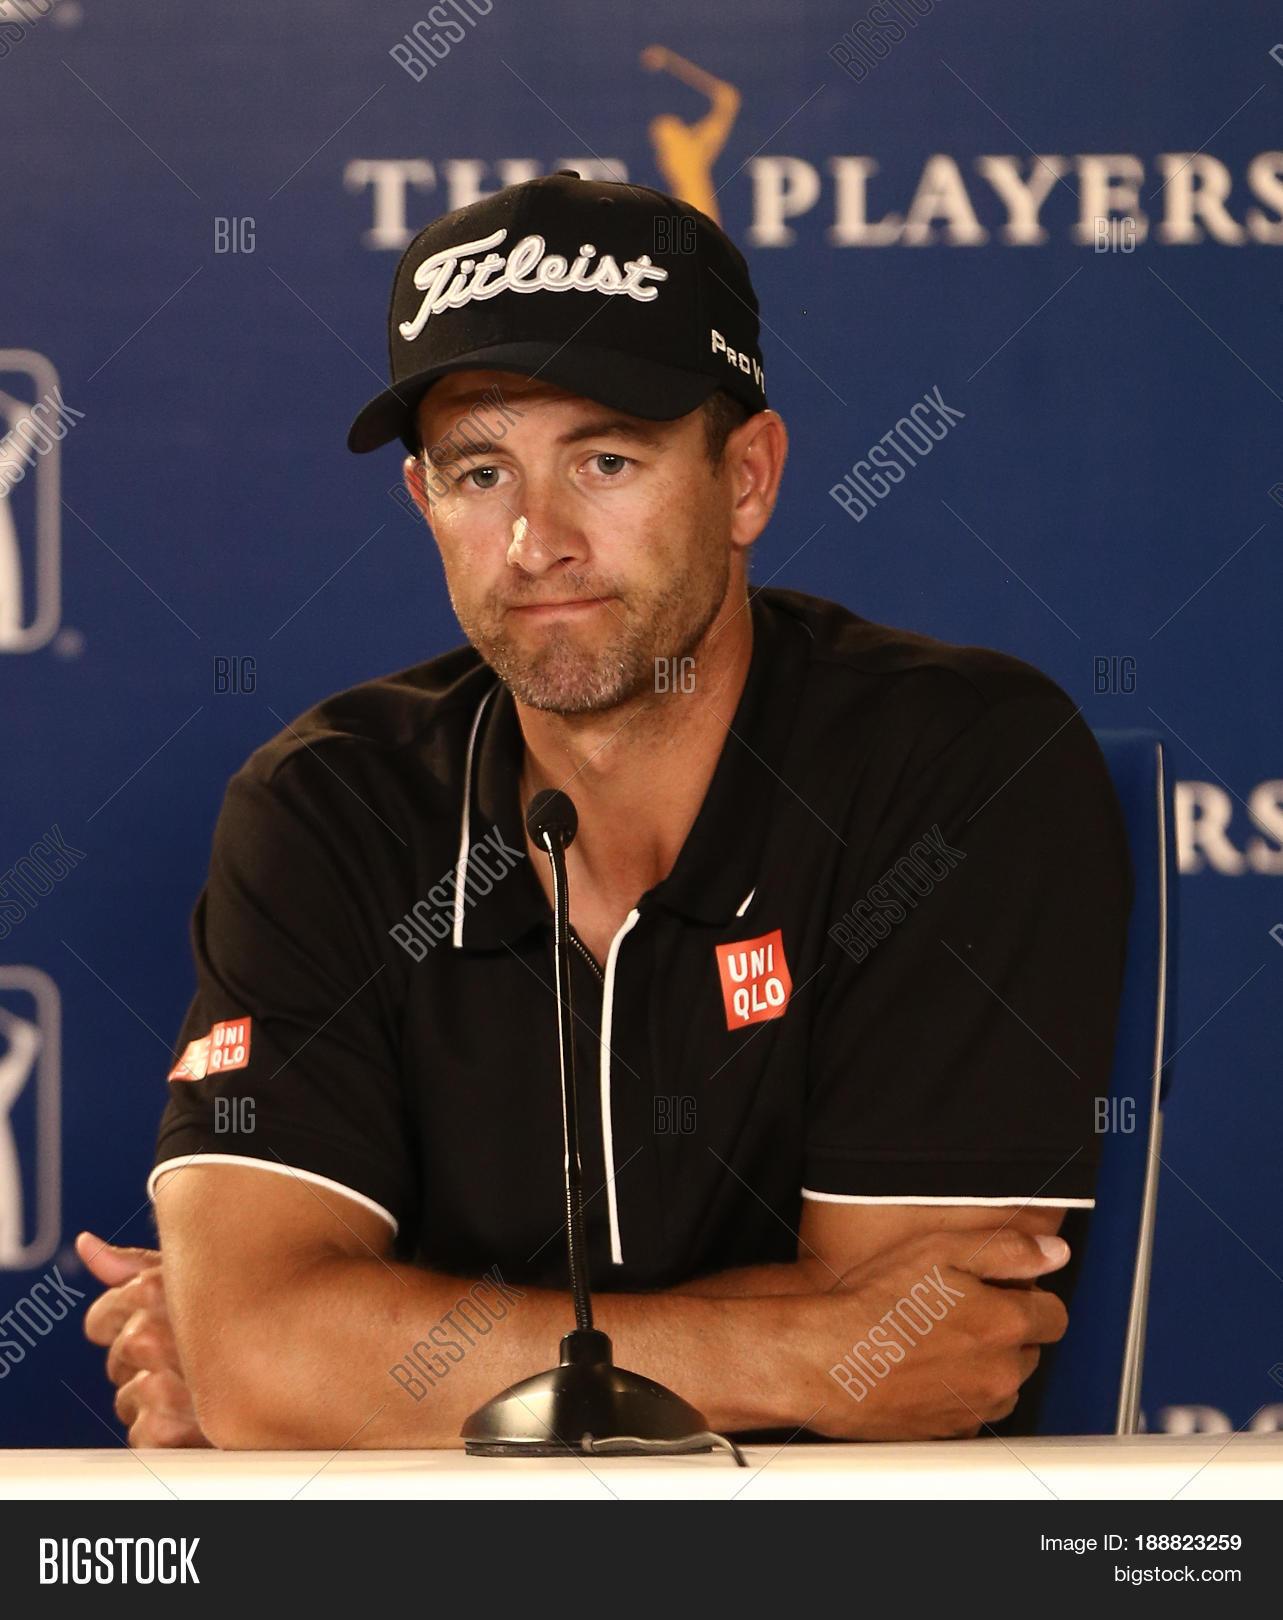 Ponte Vedra Beach Fl May 9 Golfer Adam Scott Speaks To The Media